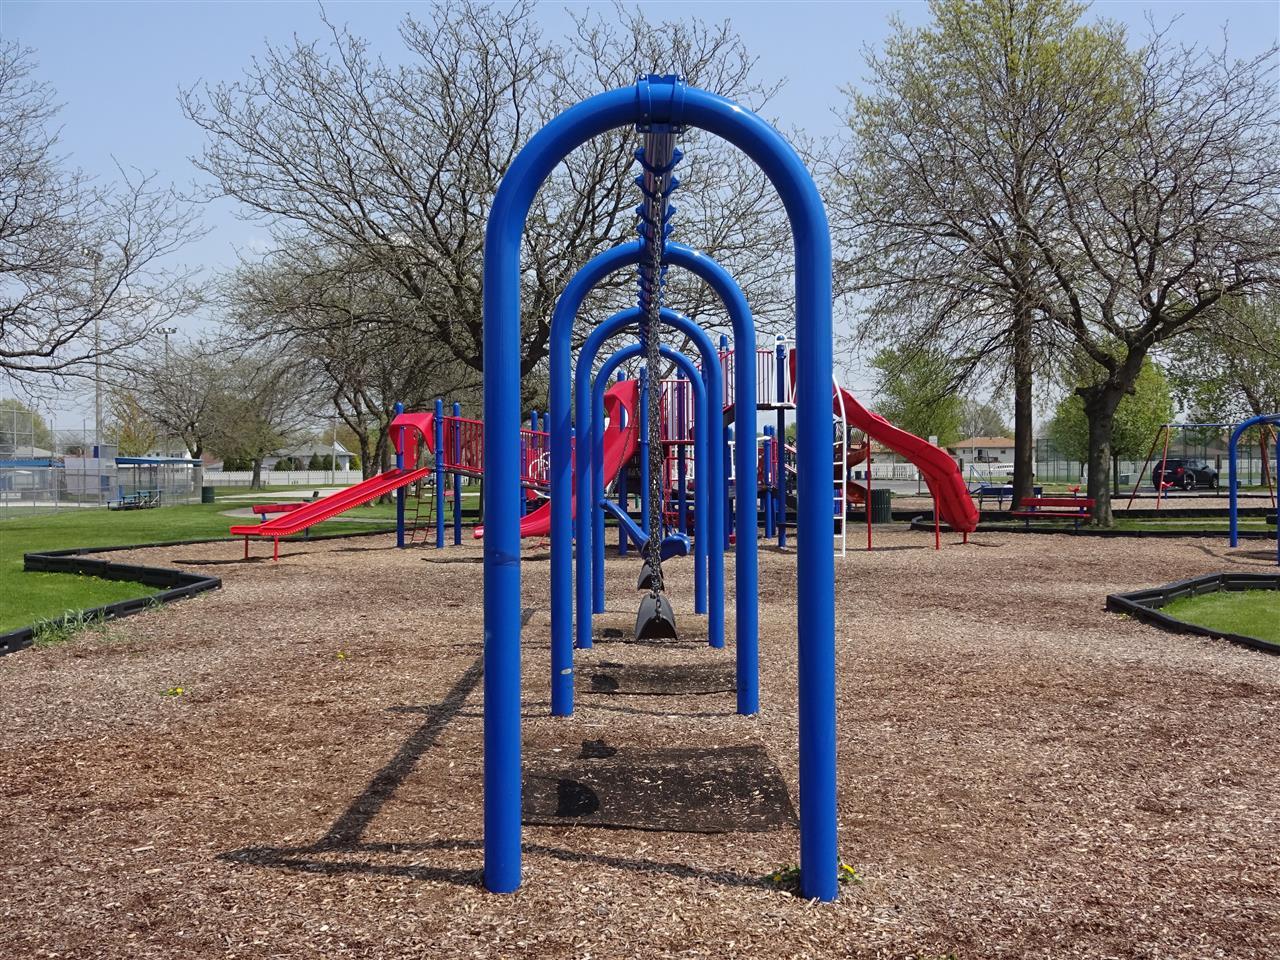 Recreational children's park in Dyer, Indiana